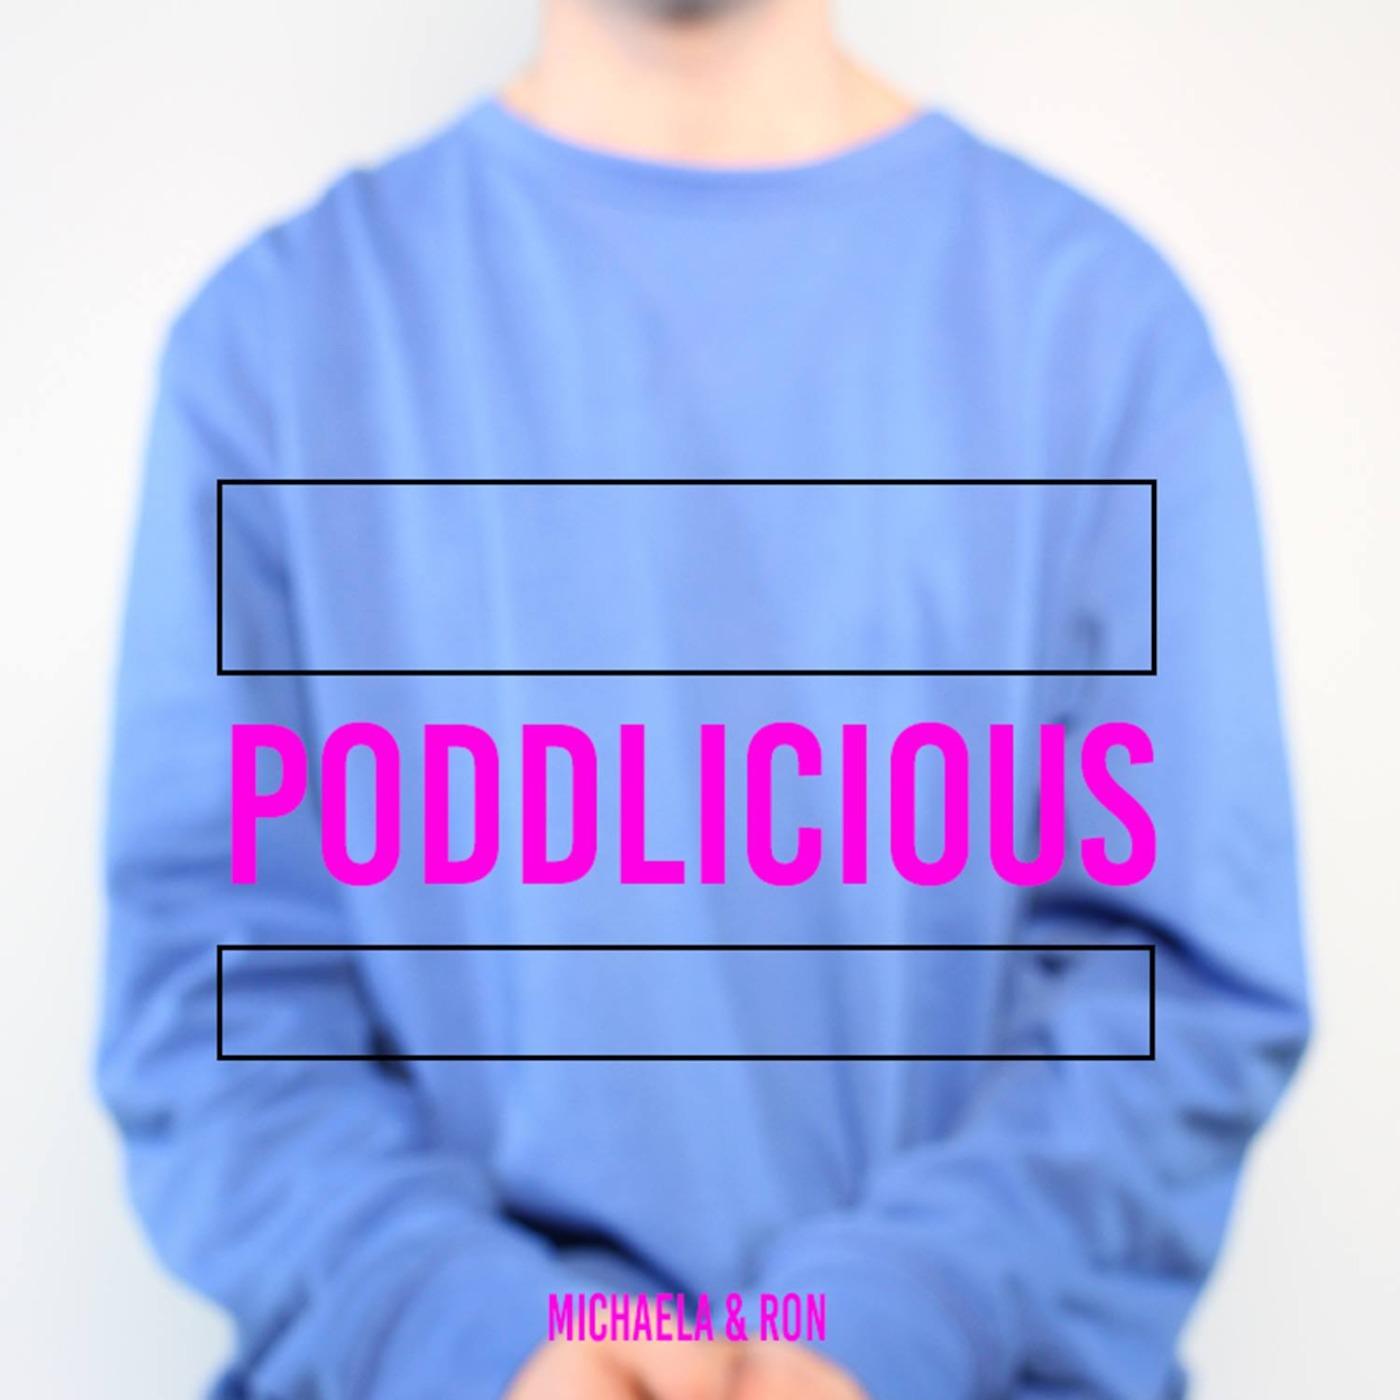 Poddlicious